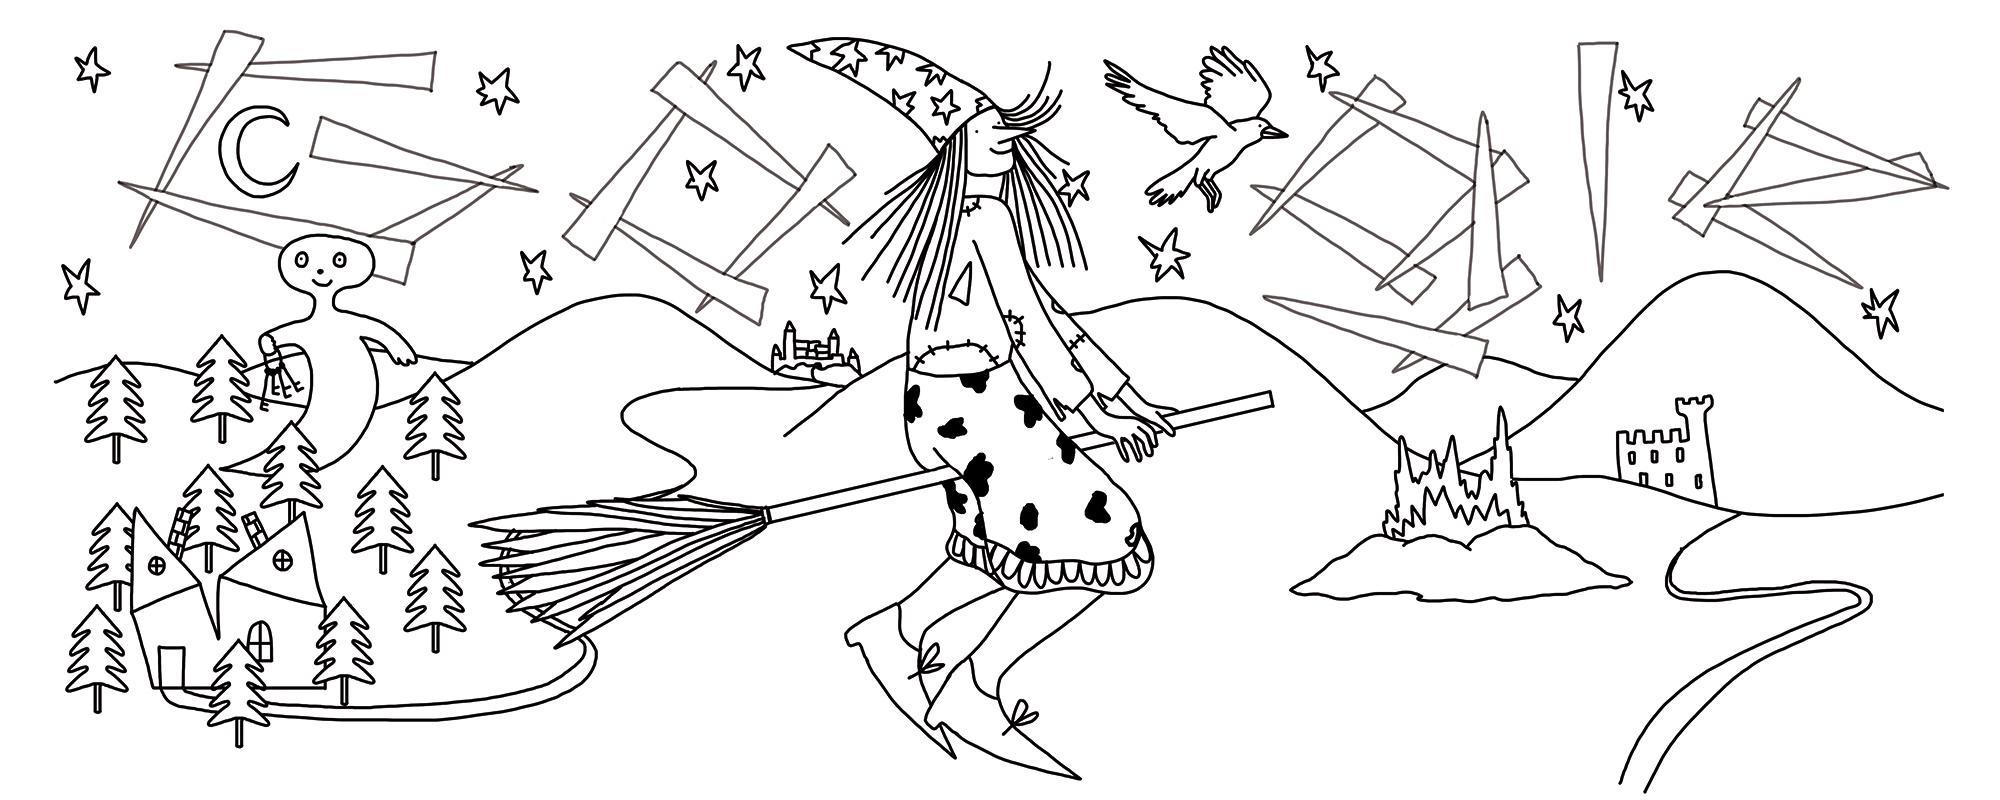 Preussler Doodle –early draft